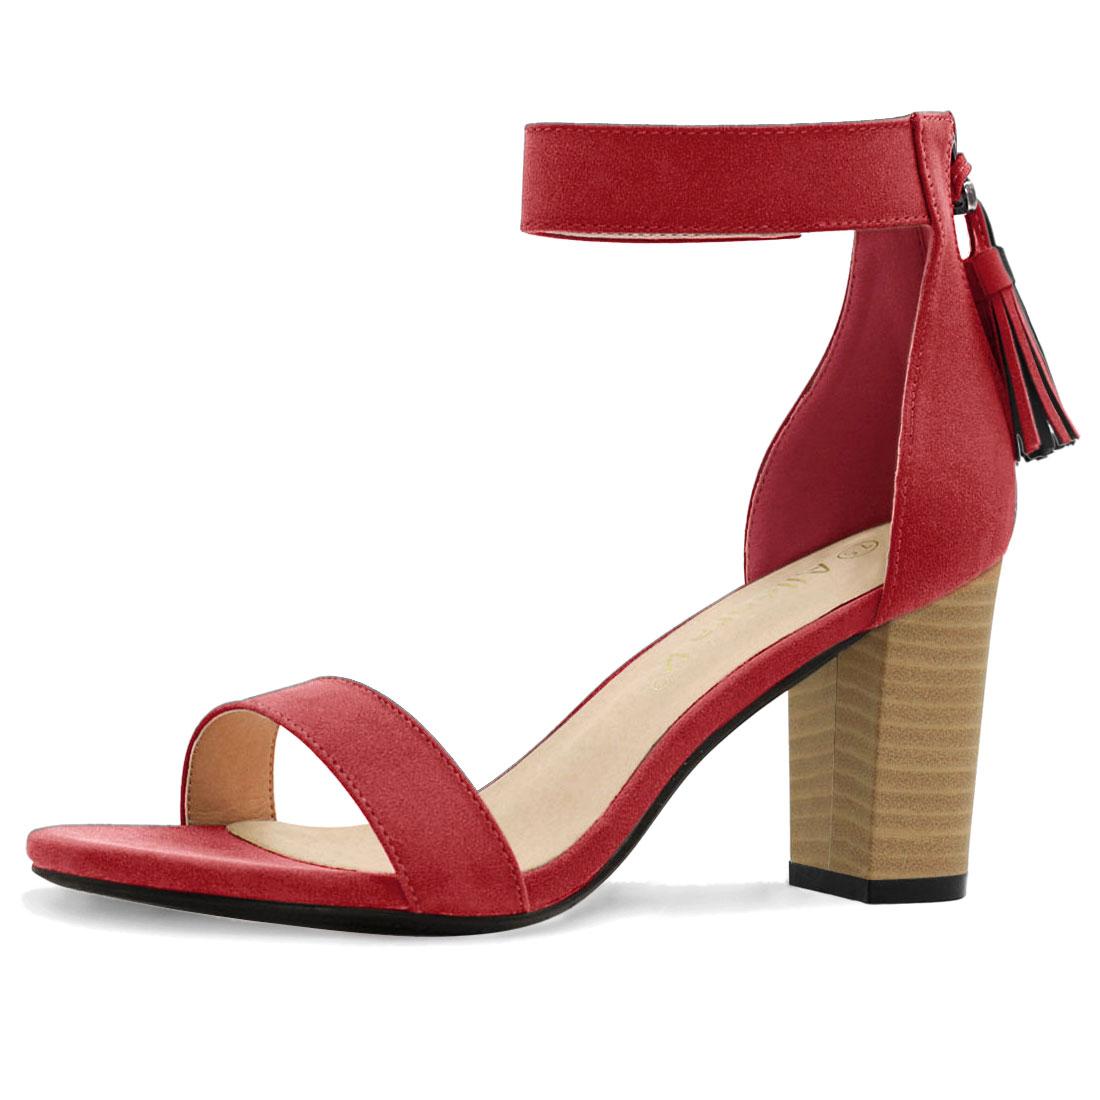 Women Open Toe Tassel Stacked Heel Ankle Strap Sandals Red US 7.5